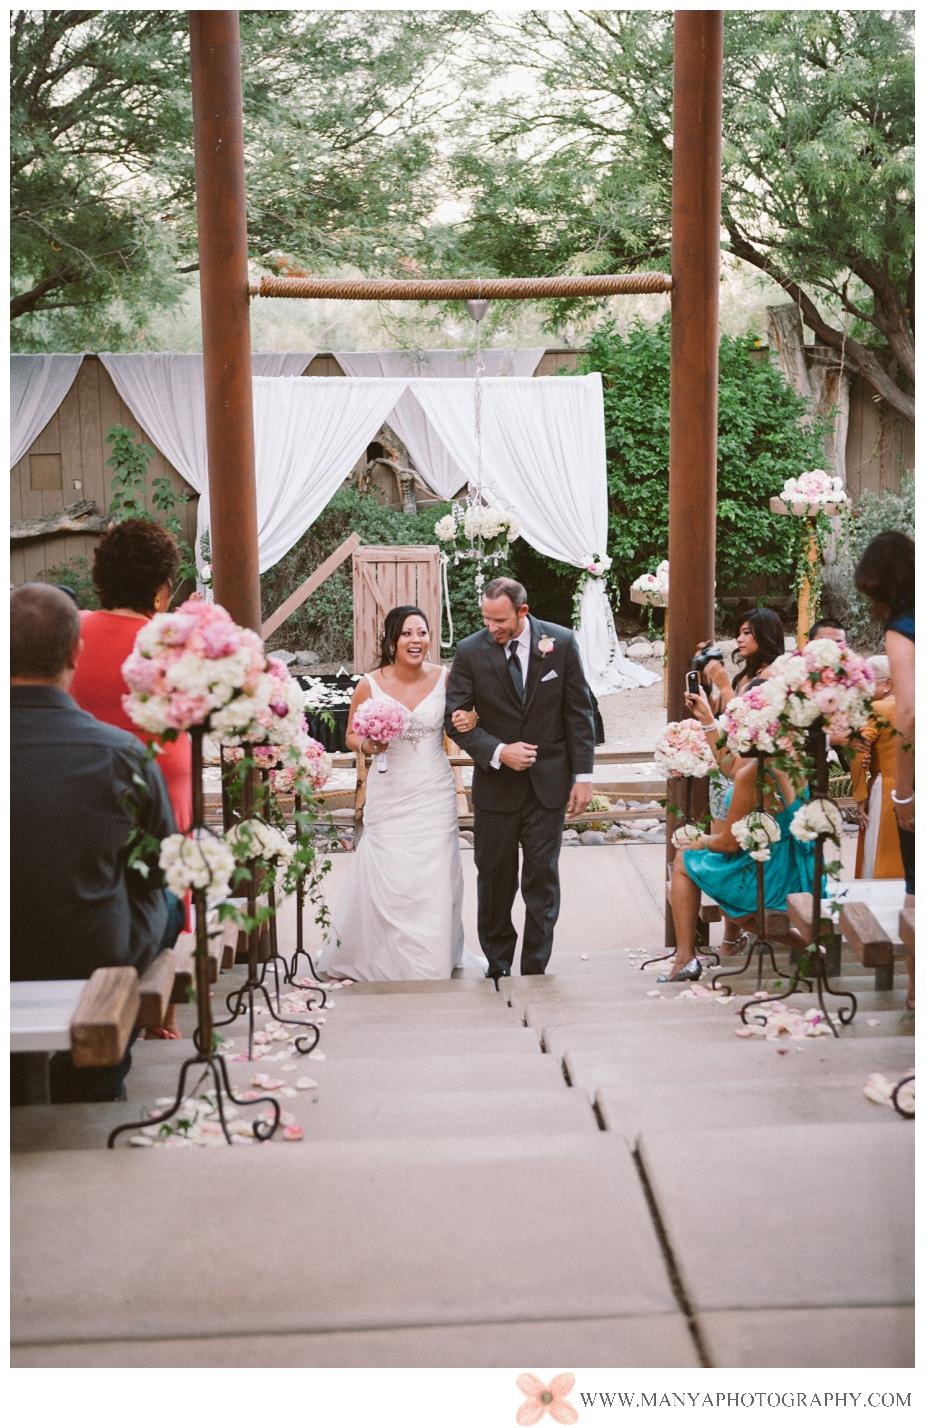 2013-07-28_0046 - Orange County Wedding Photographer